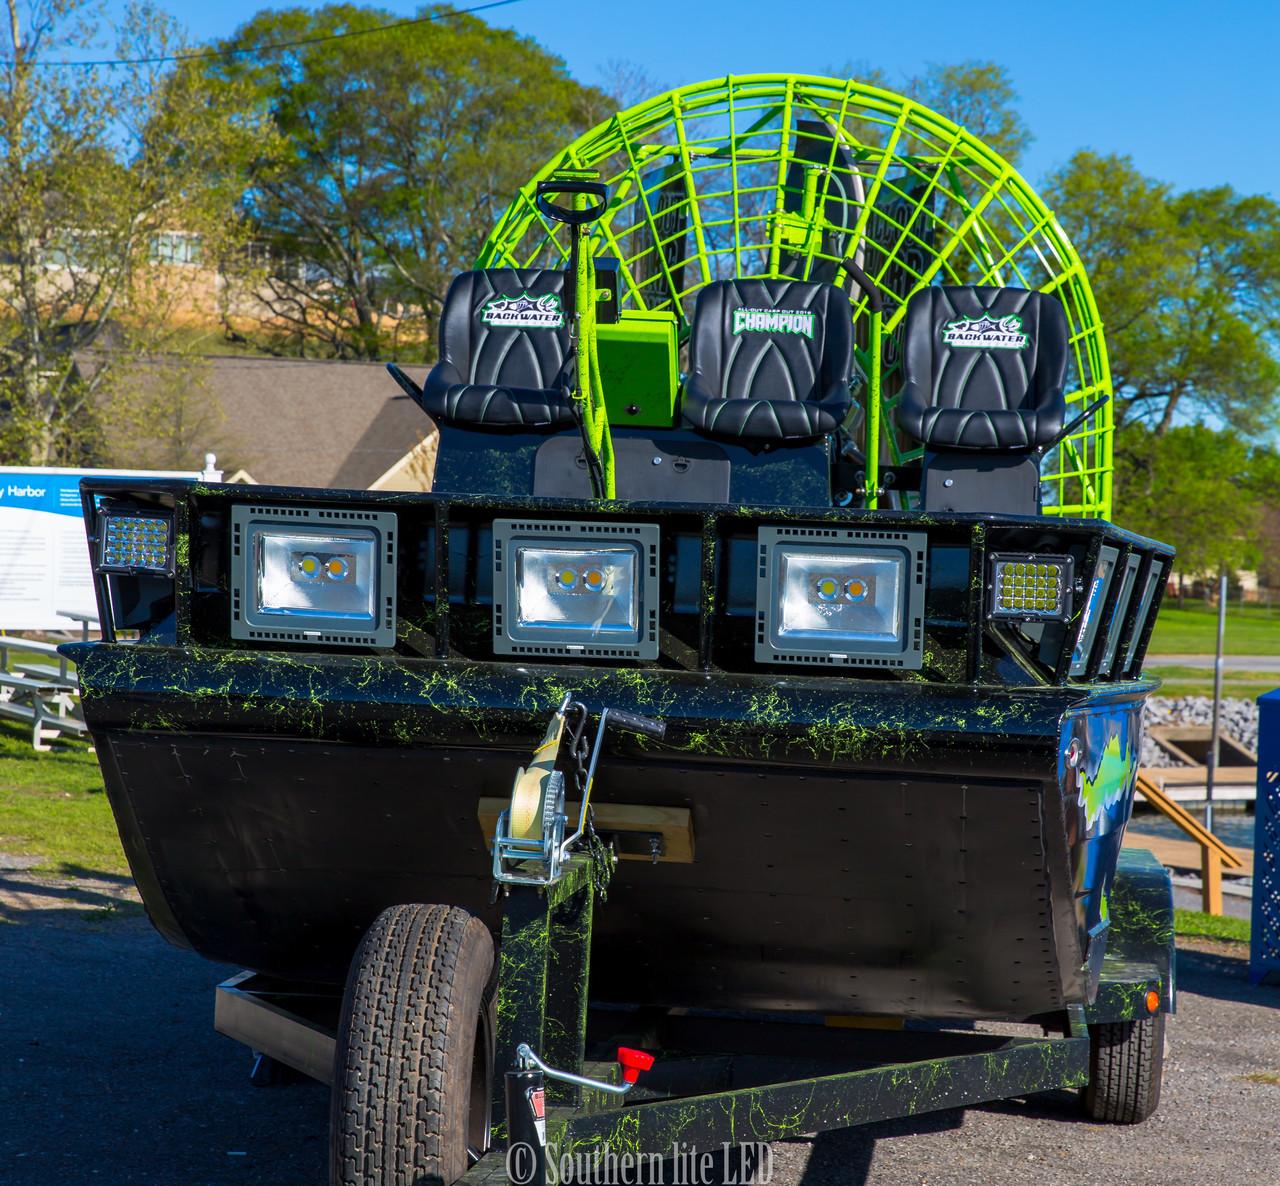 **NEW** Southern lite LED Pro 160 Watt LED Bowfishing Light